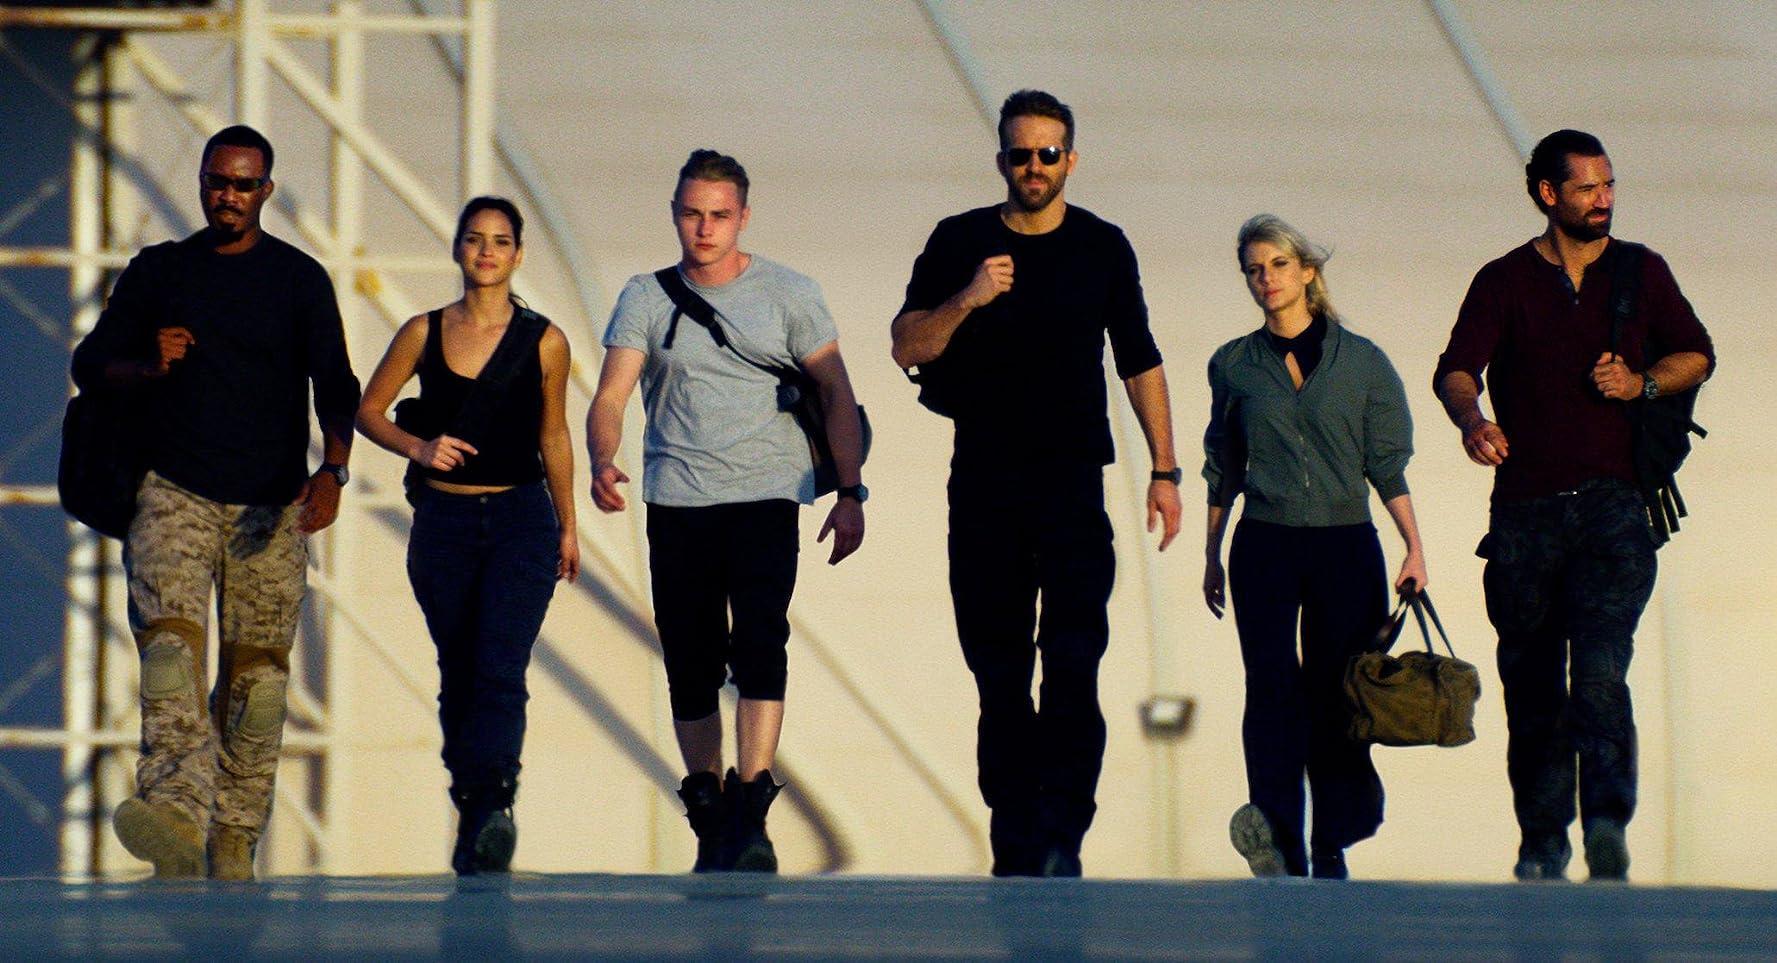 Ryan Reynolds, Mélanie Laurent, Manuel Garcia-Rulfo, Corey Hawkins, Ben Hardy, and Adria Arjona in 6 Underground (2019)